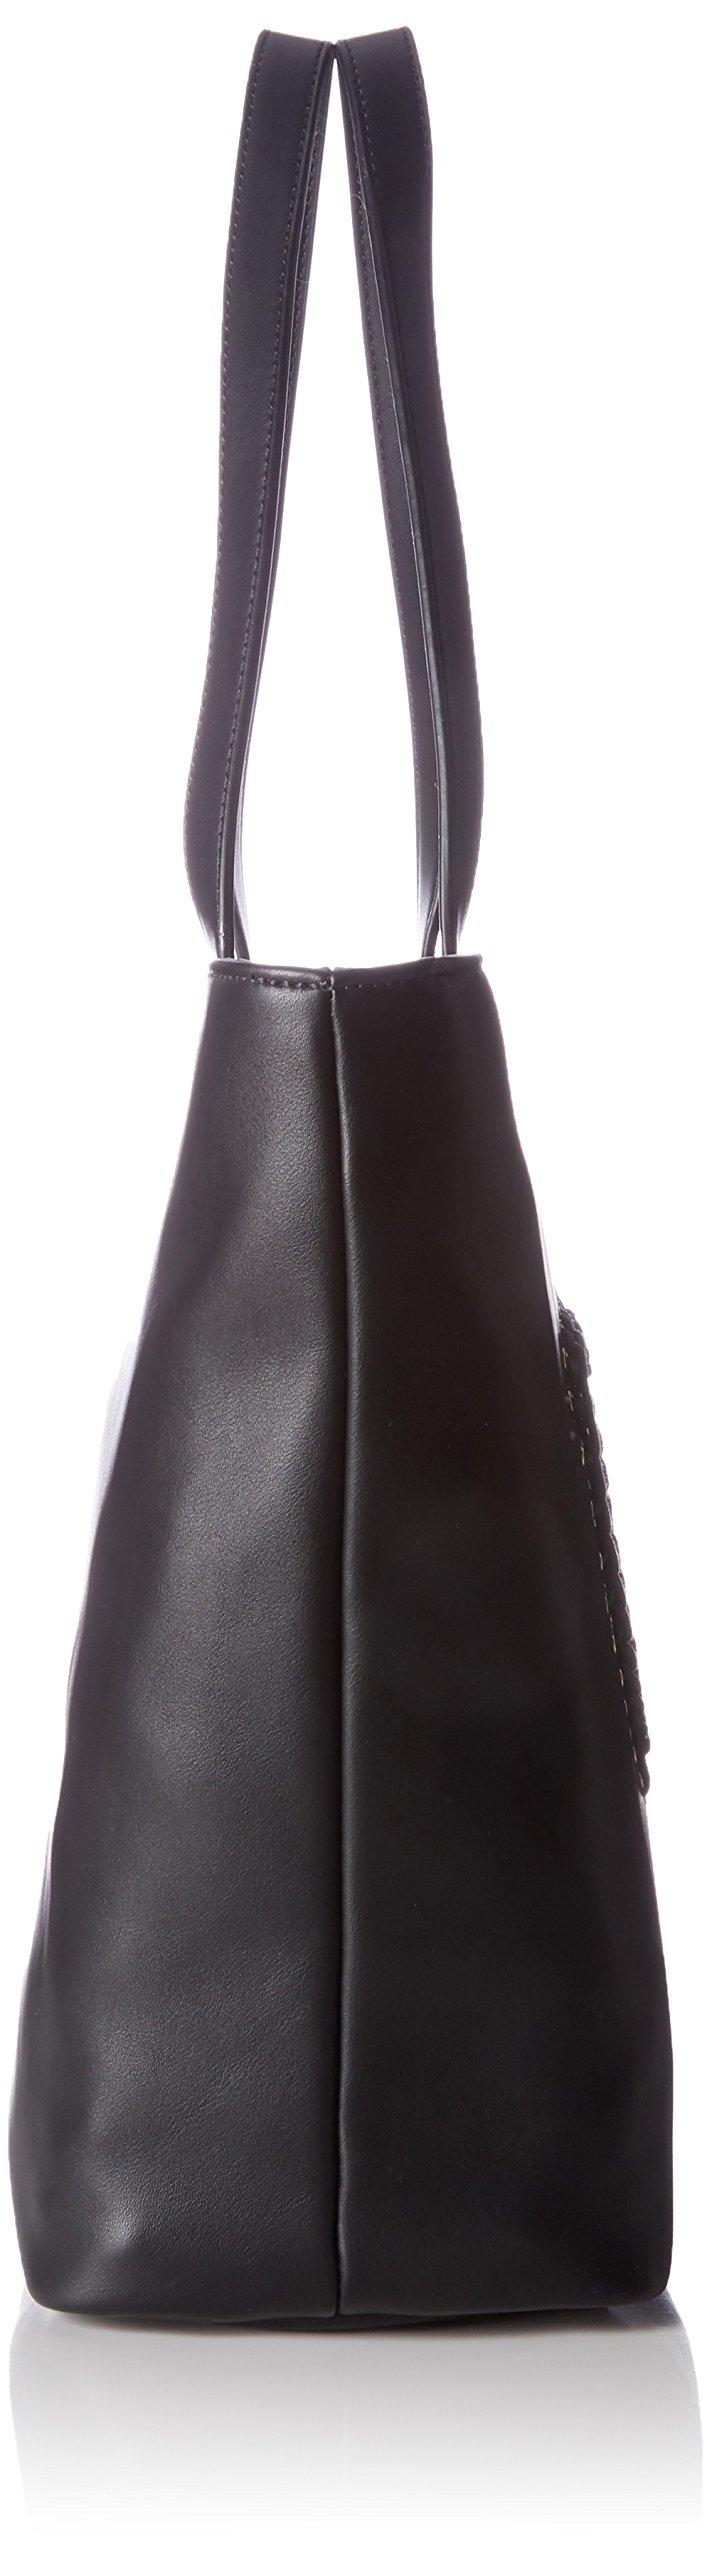 Love Moschino – Borsa Calf Pu Nero, Bolsos totes Mujer, Schwarz (Black), 31x45x12 cm (W x H D)